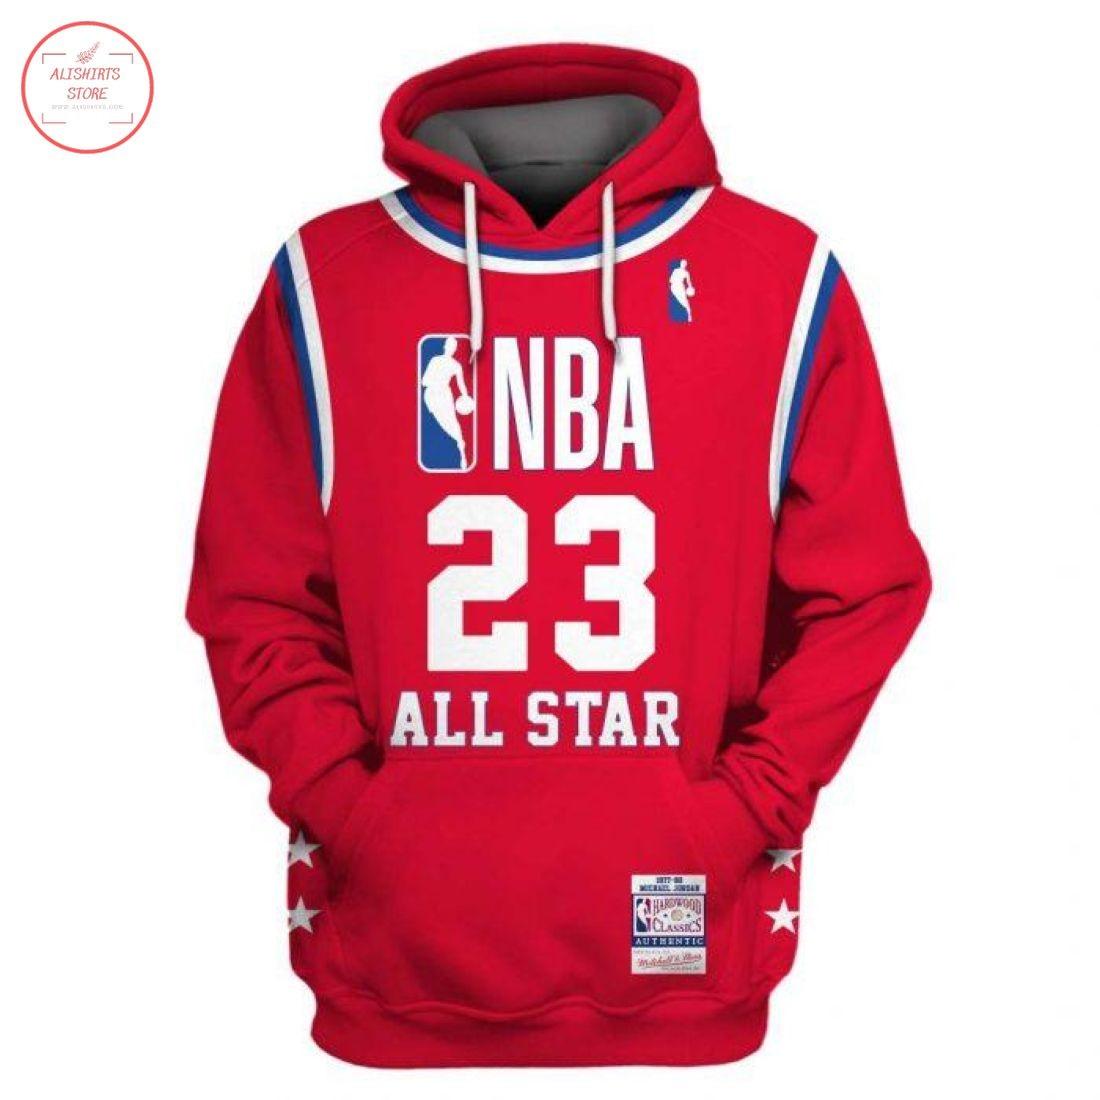 Michael Jordan 23 All Star NBA Hoodie